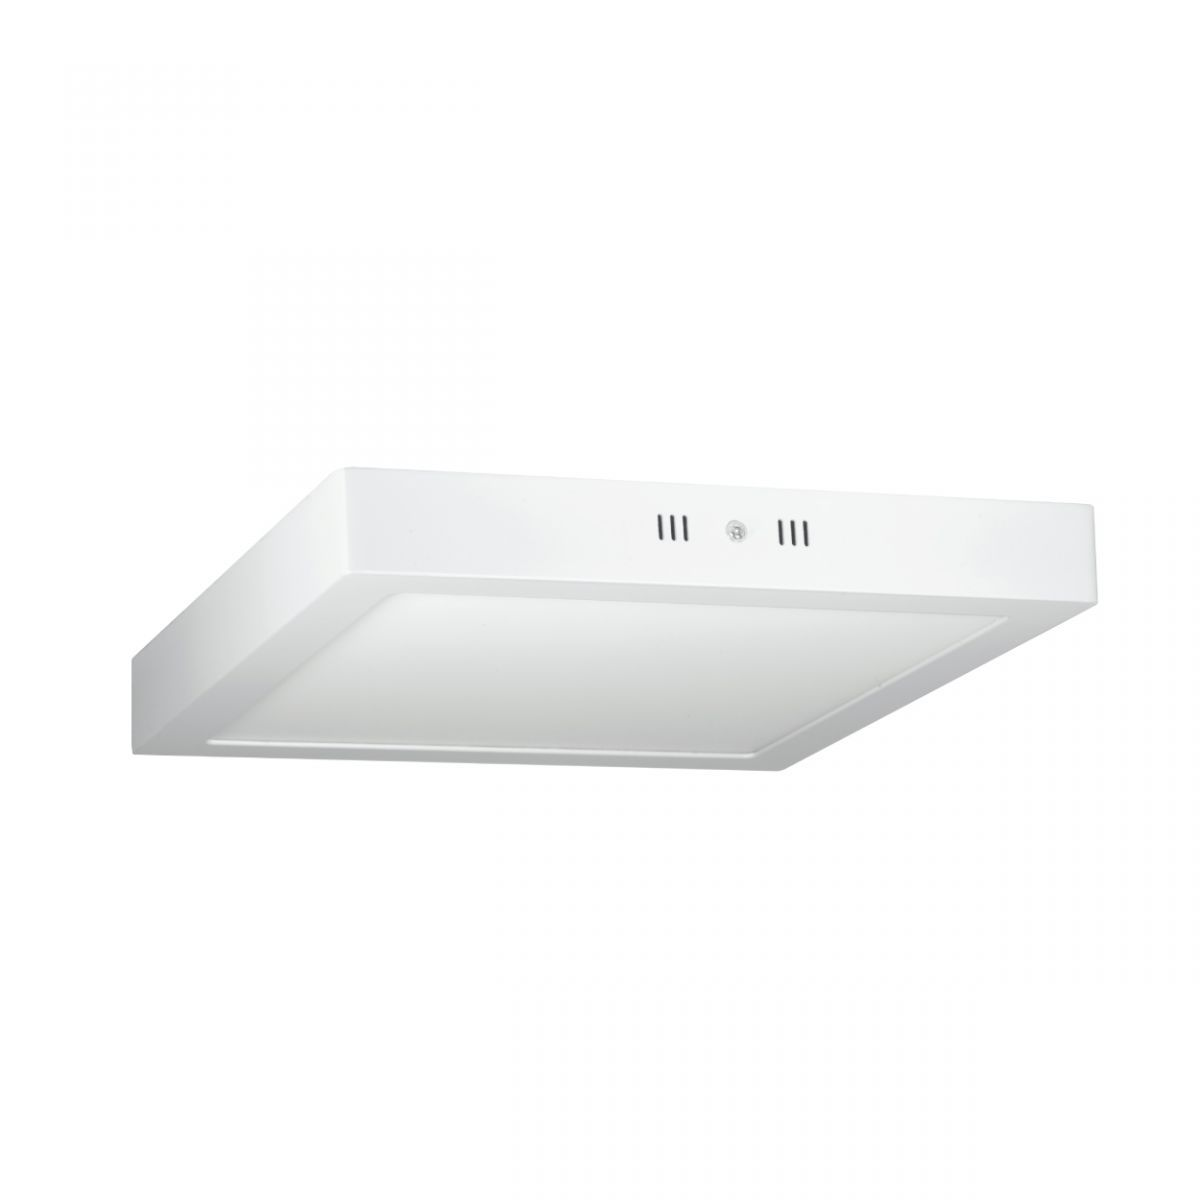 Luminária Plafon LED 6w Sobrepor Branco Frio Redonda - Luxtek